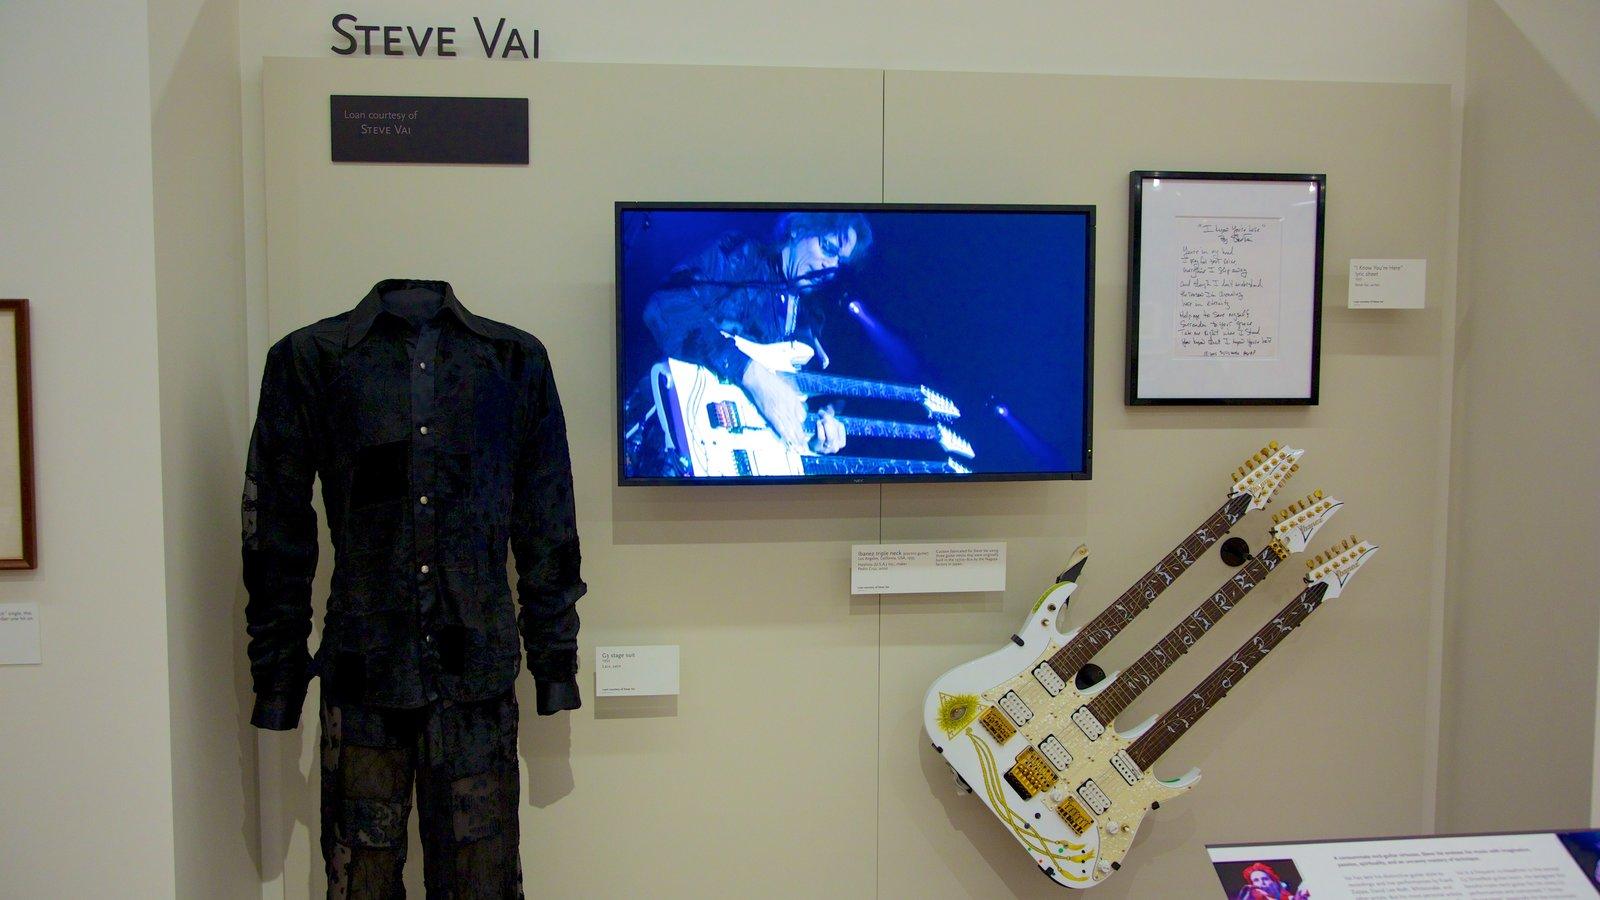 Museu dos Instrumentos Musicais caracterizando música e vistas internas